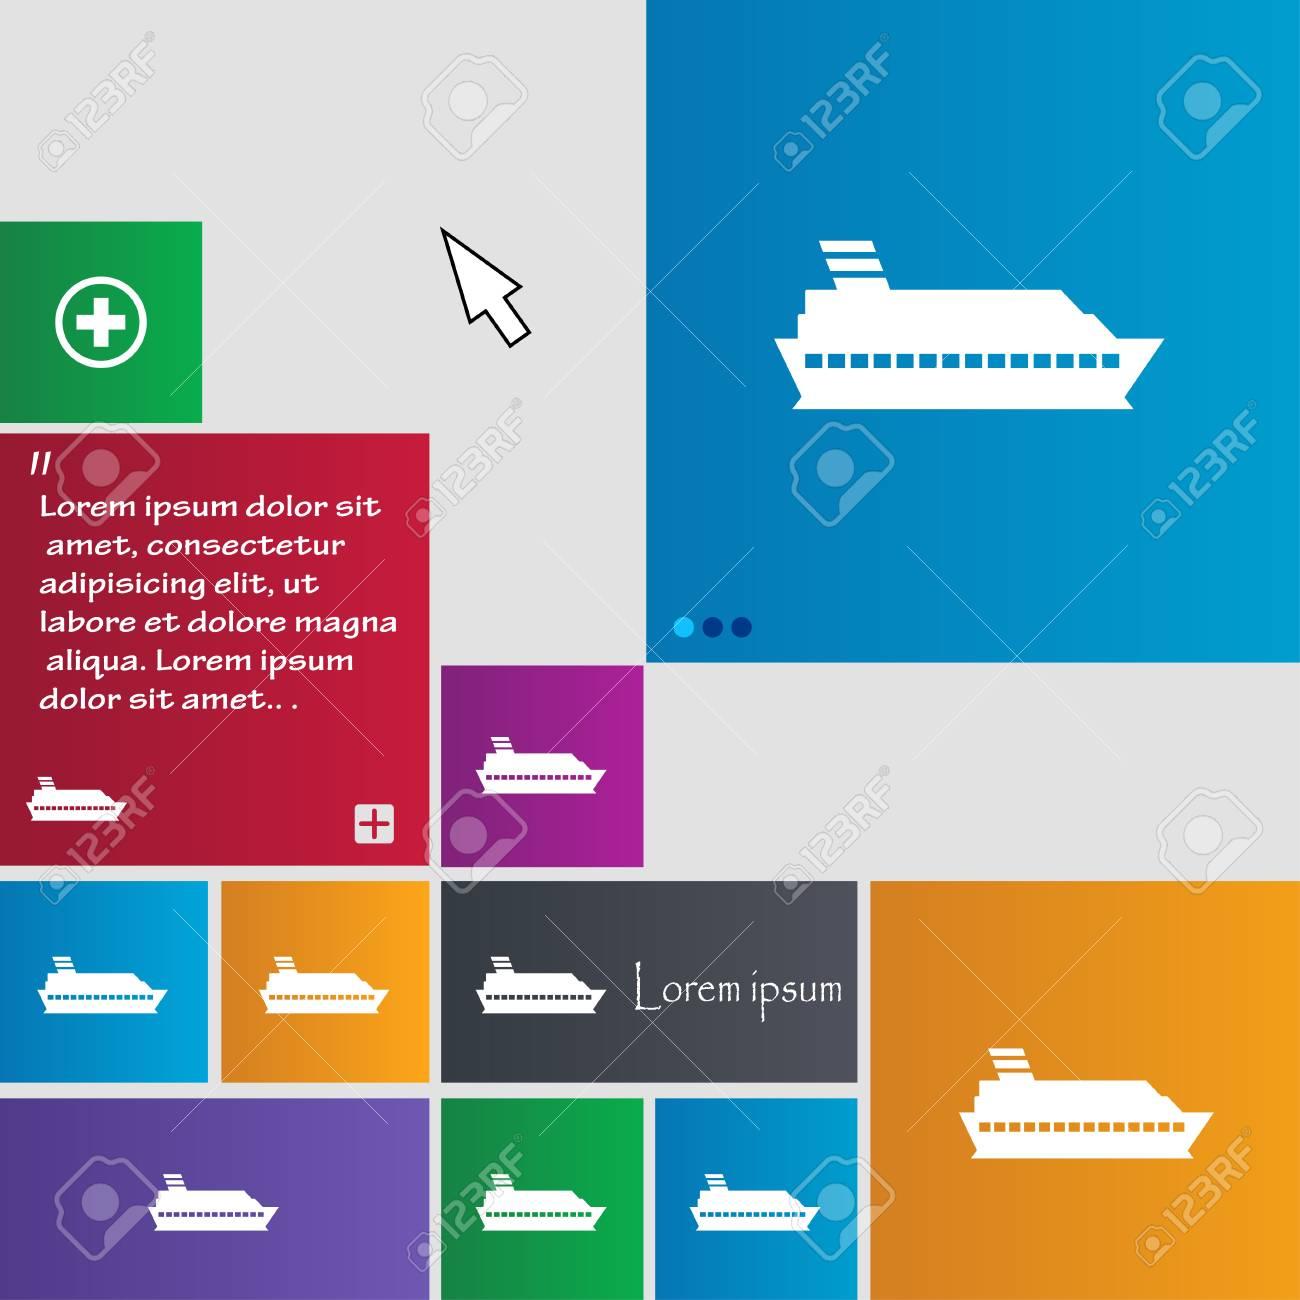 Cruise sea ship icon sign  buttons  Modern interface website